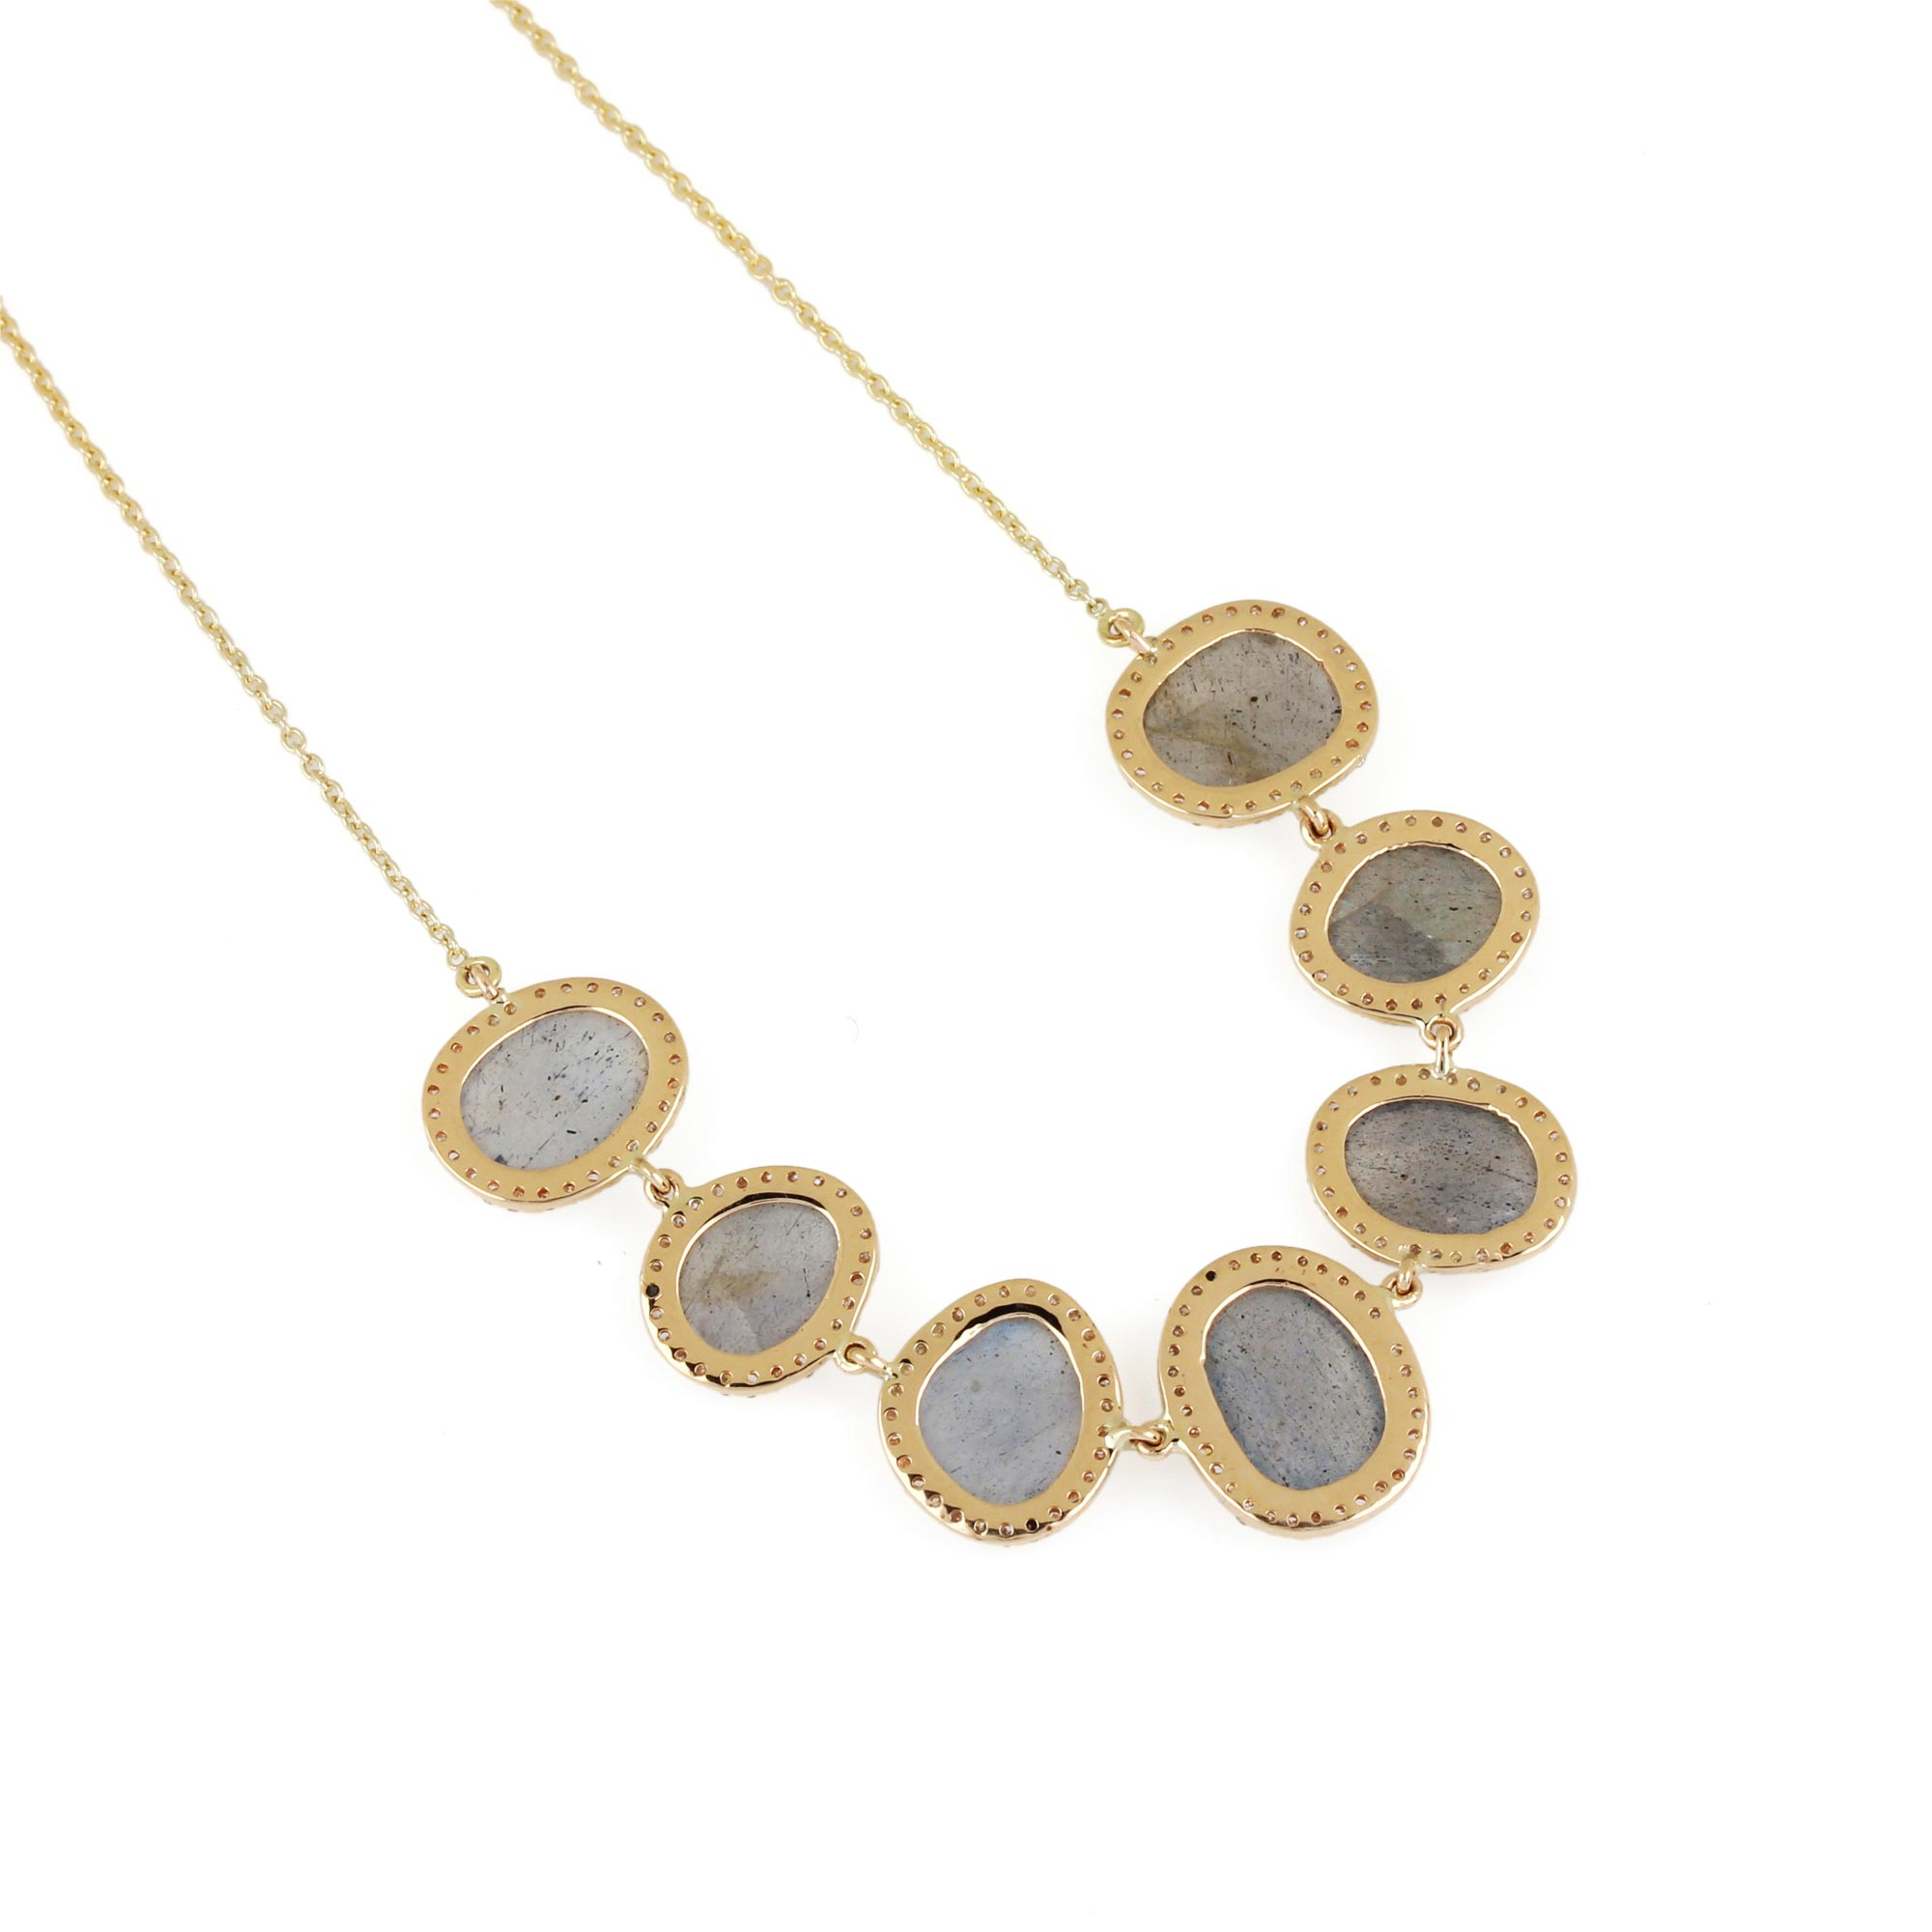 Labradorite Pendant Chain Necklace Pave Diamond 14K Solid Gold Jewelry